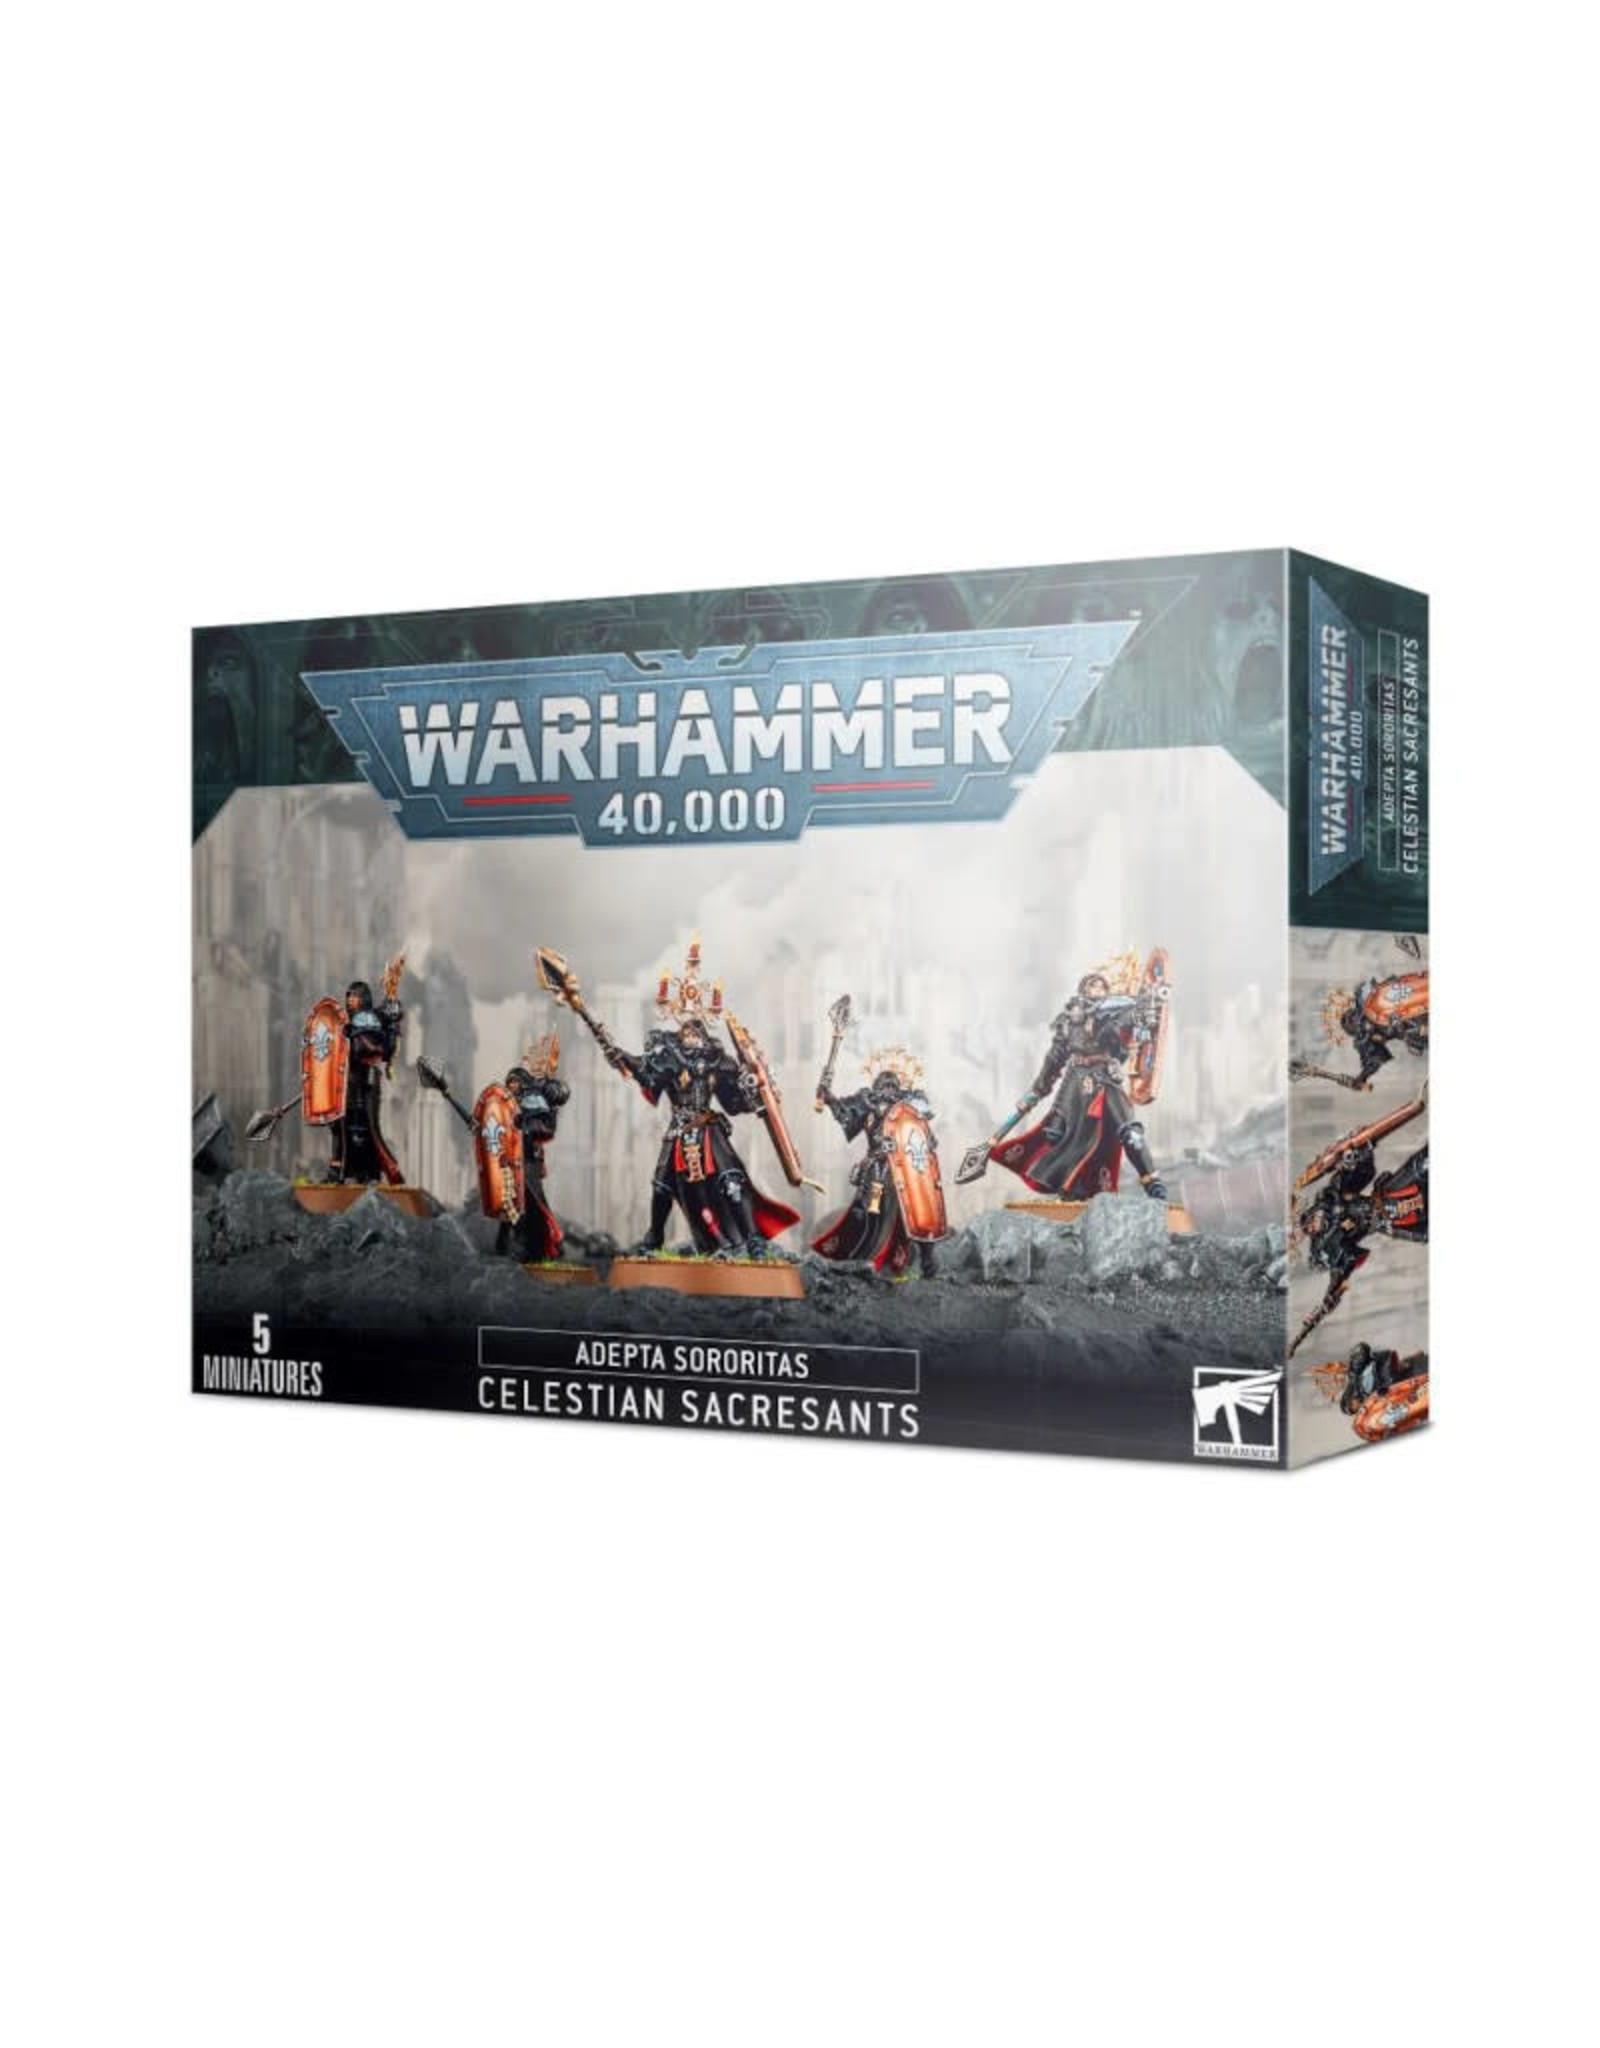 Games Workshop Warhammer 40K Adepta Sororitas Celestian Sacresants